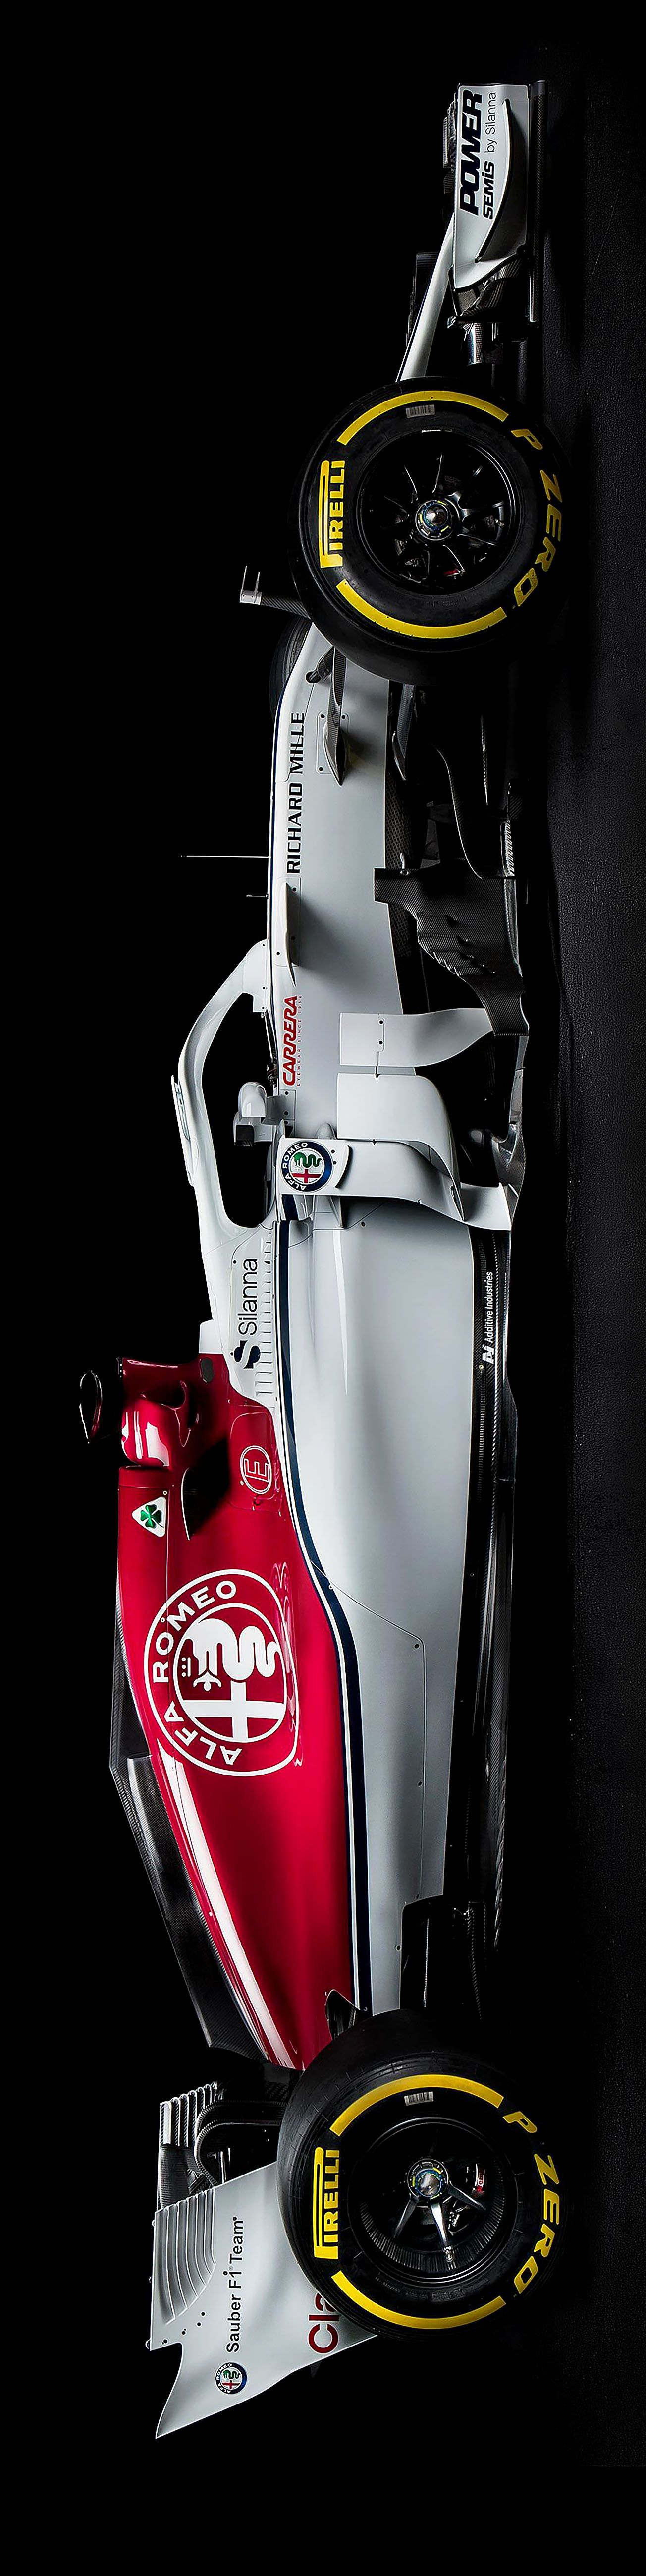 2018/2/20: Twitter: @SauberF1Team:  If you haven't already, head to our #C37 gallery for full list of beauty shots  The cars, drivers' helmets, team kit... galore! sauberf1team.com/photos  #AlfaRomeoSauberF1Team #Formula1 #F1 #AlfaRomeo #Sauber #SauberF1Team  #F1 #2018F1 #FormulaOne